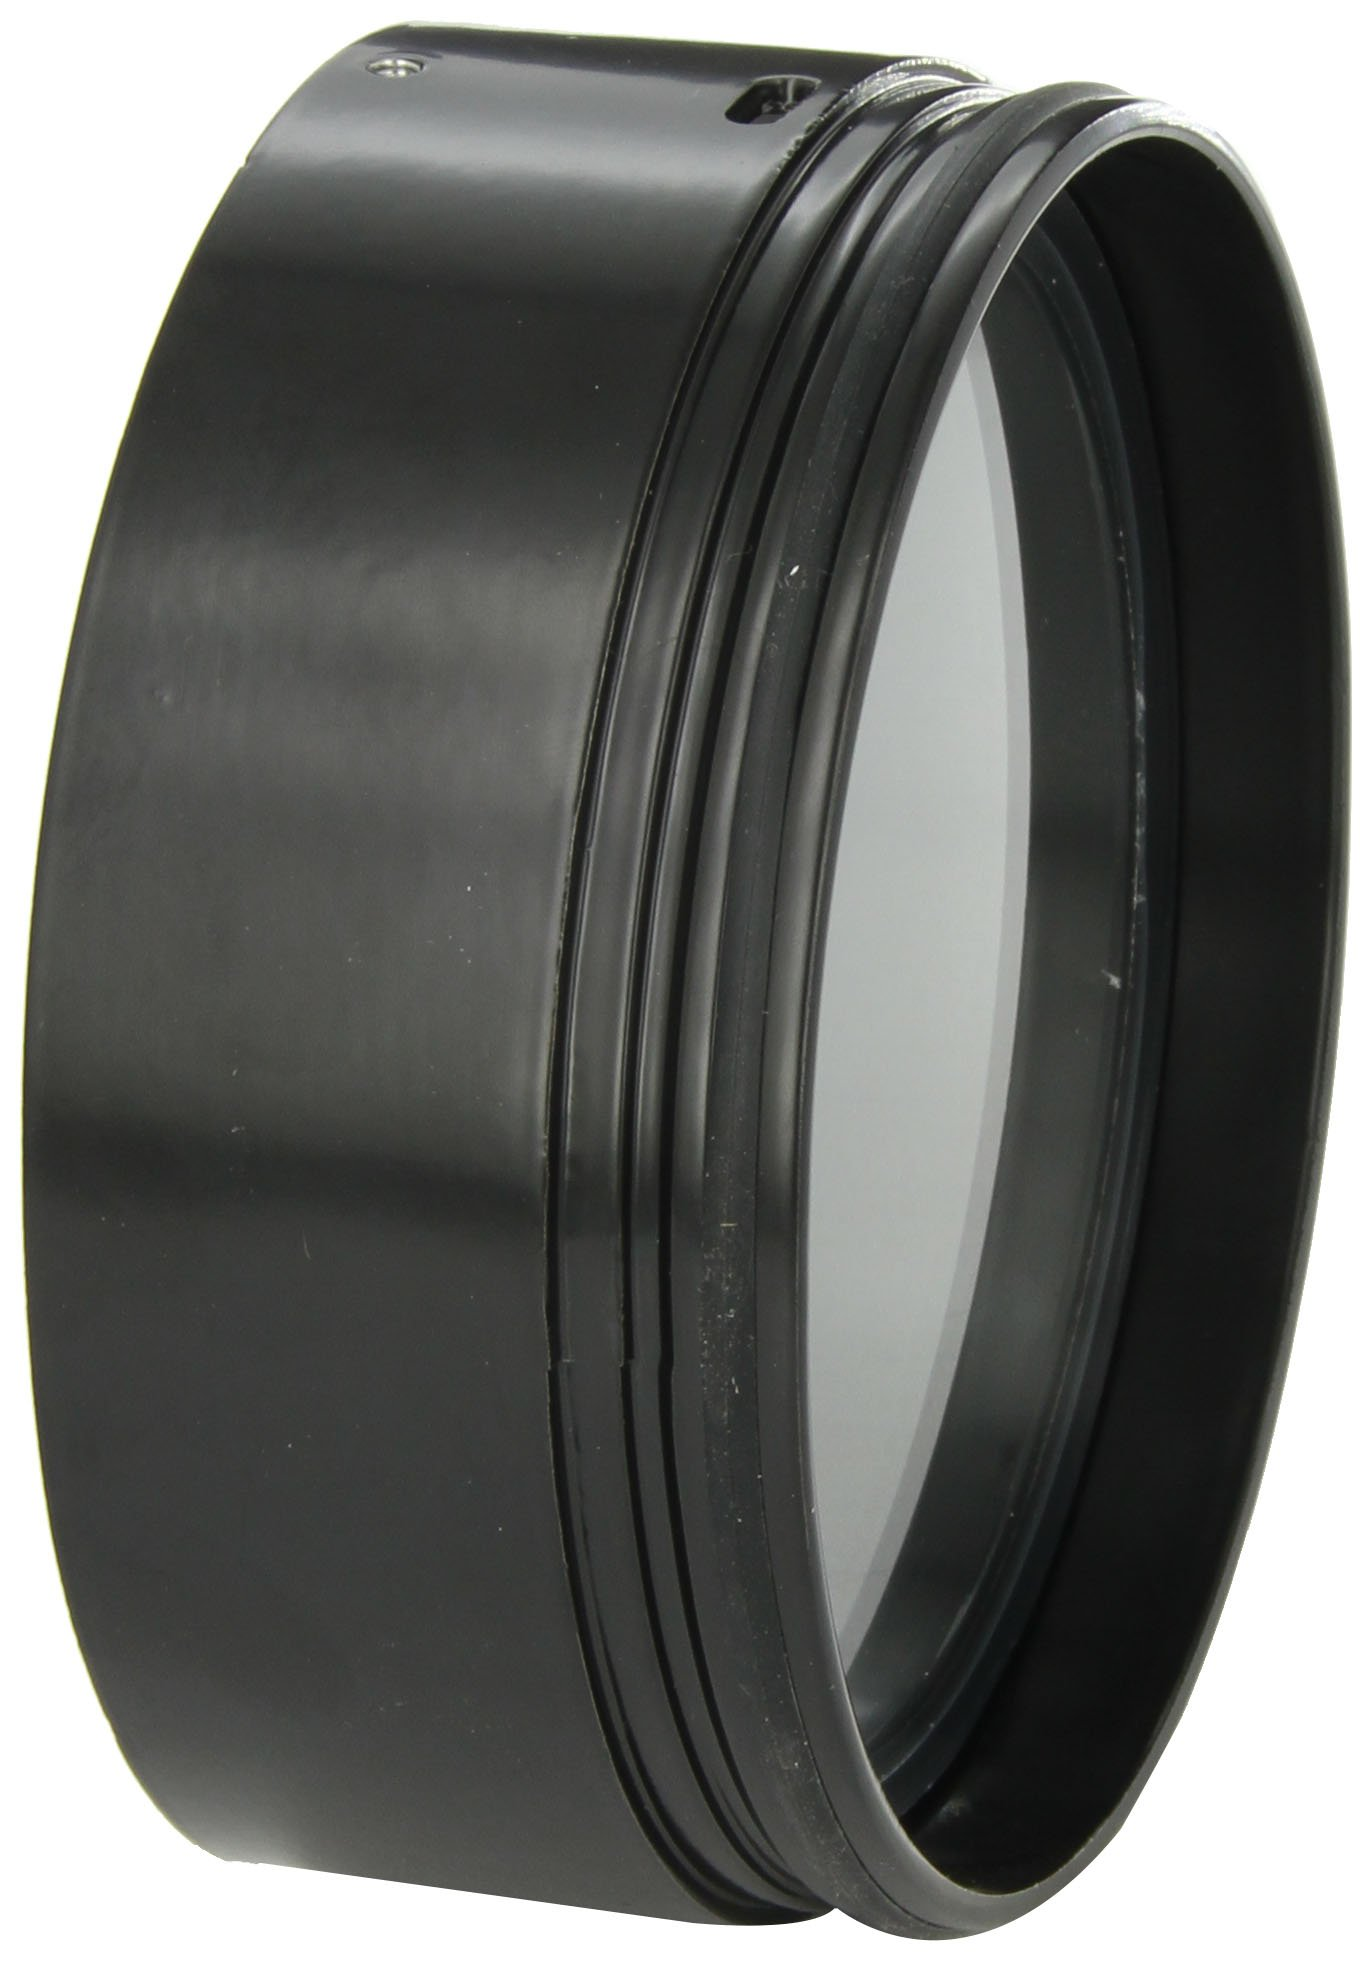 RAB Lighting HH1B H System Hood, Aluminum, 5-5/8'' Diameter x 2-1/4'' Height, Black